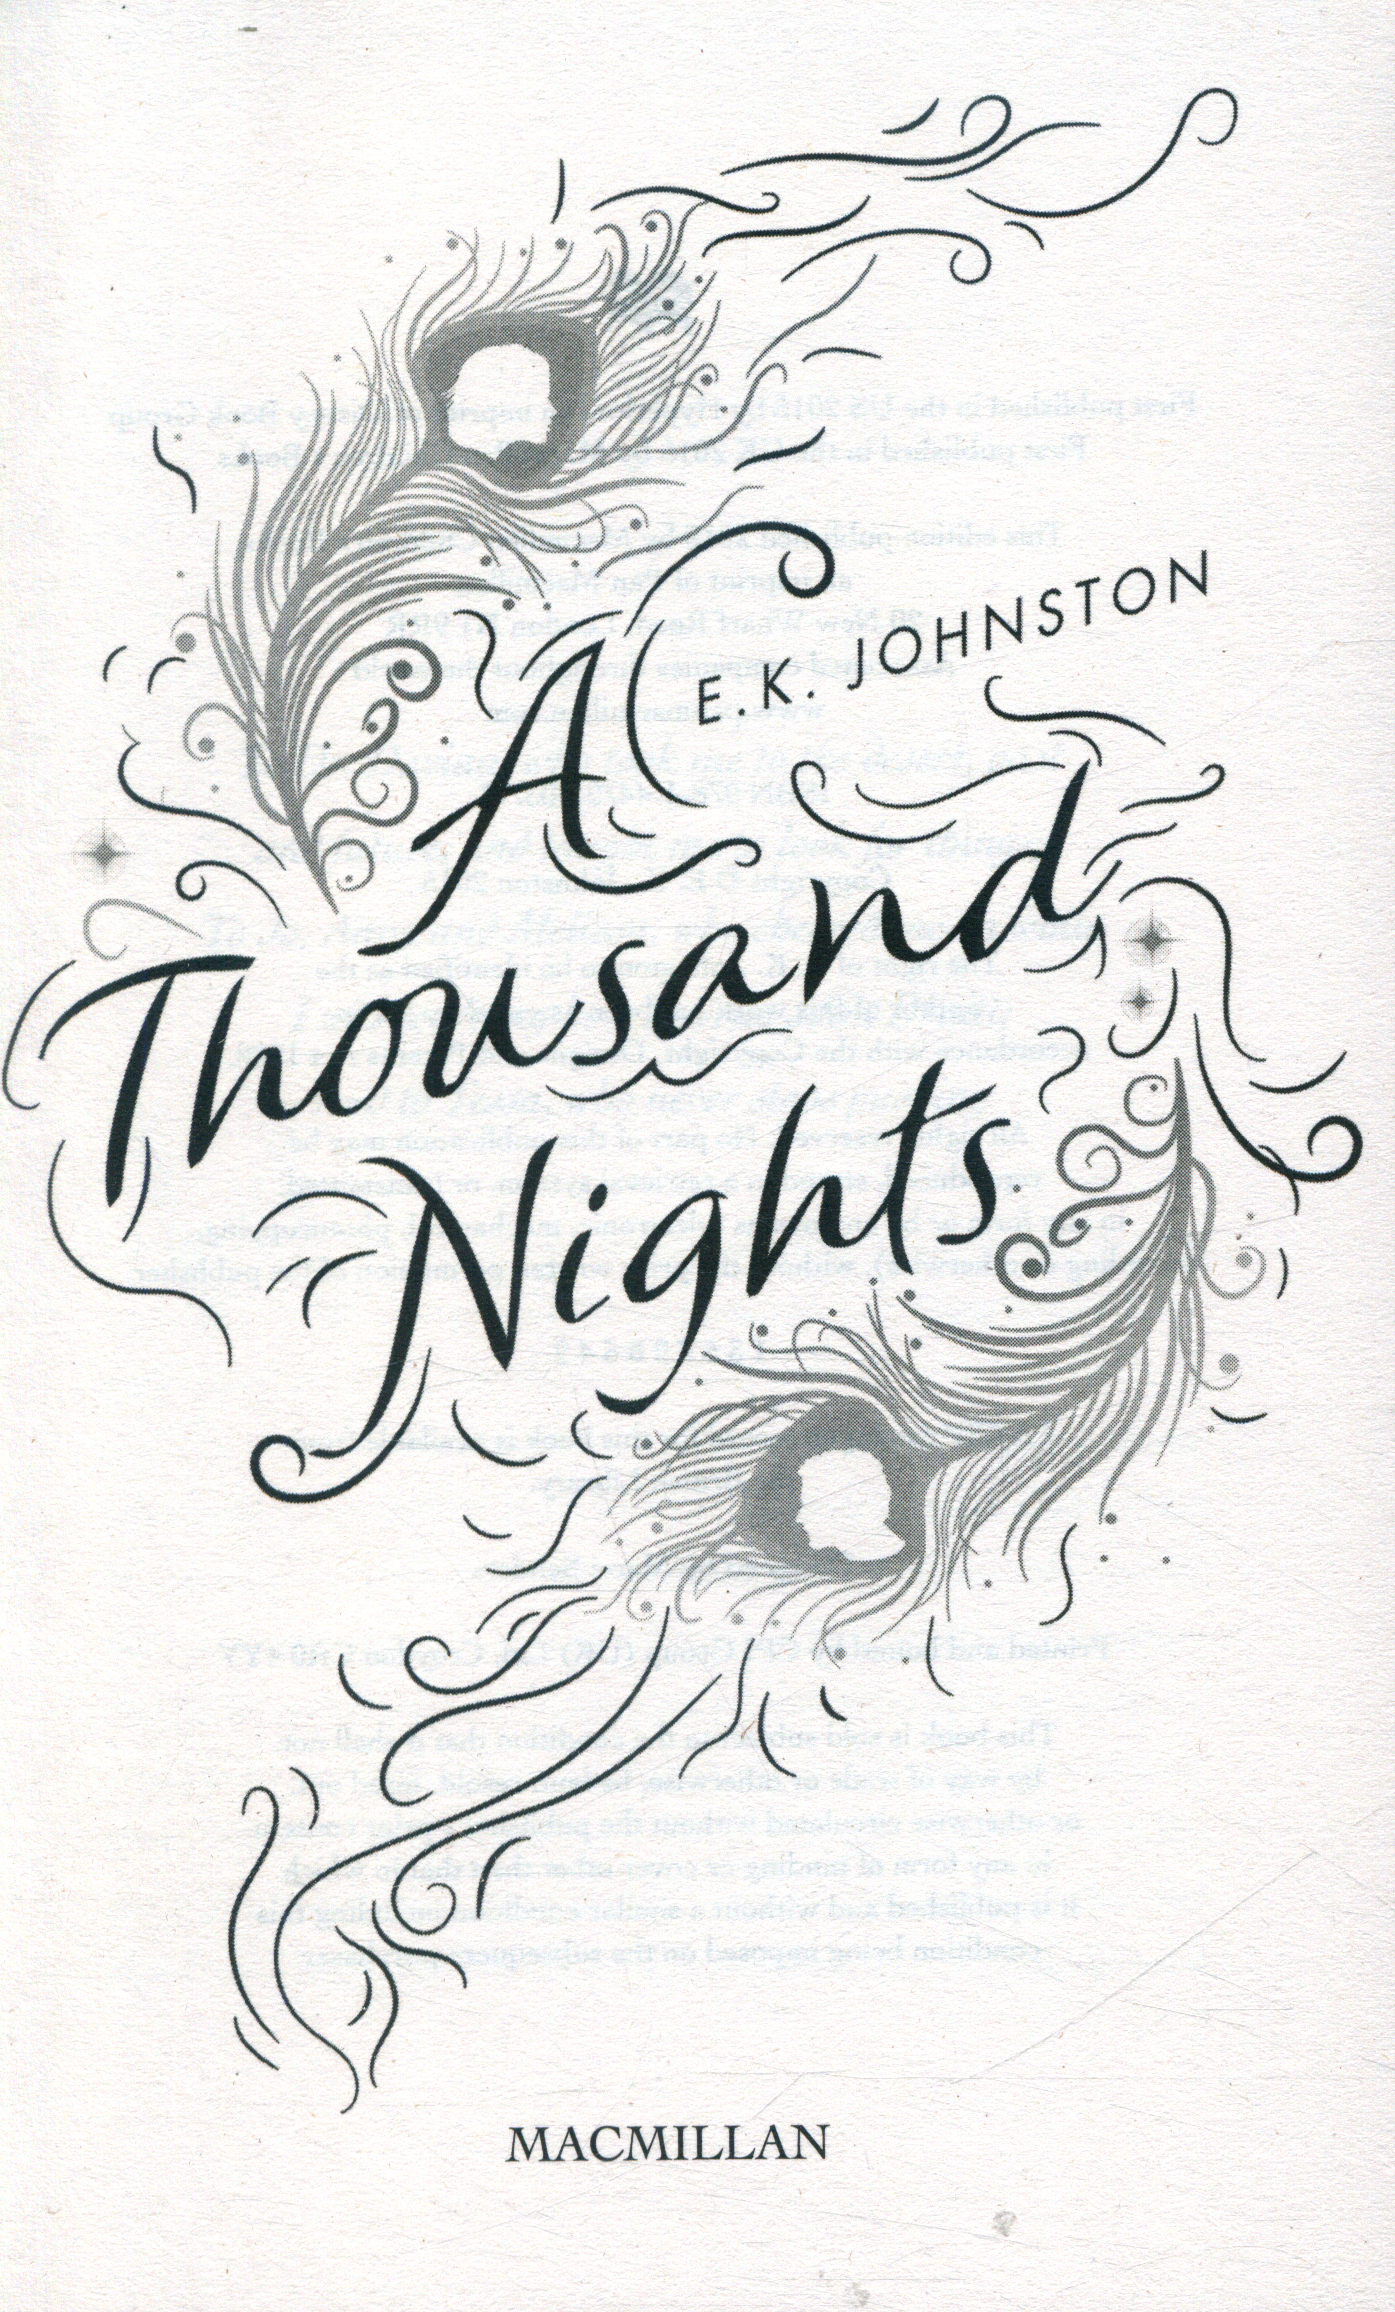 A Thousand Nights By Johnston, E.K. (9781447290377